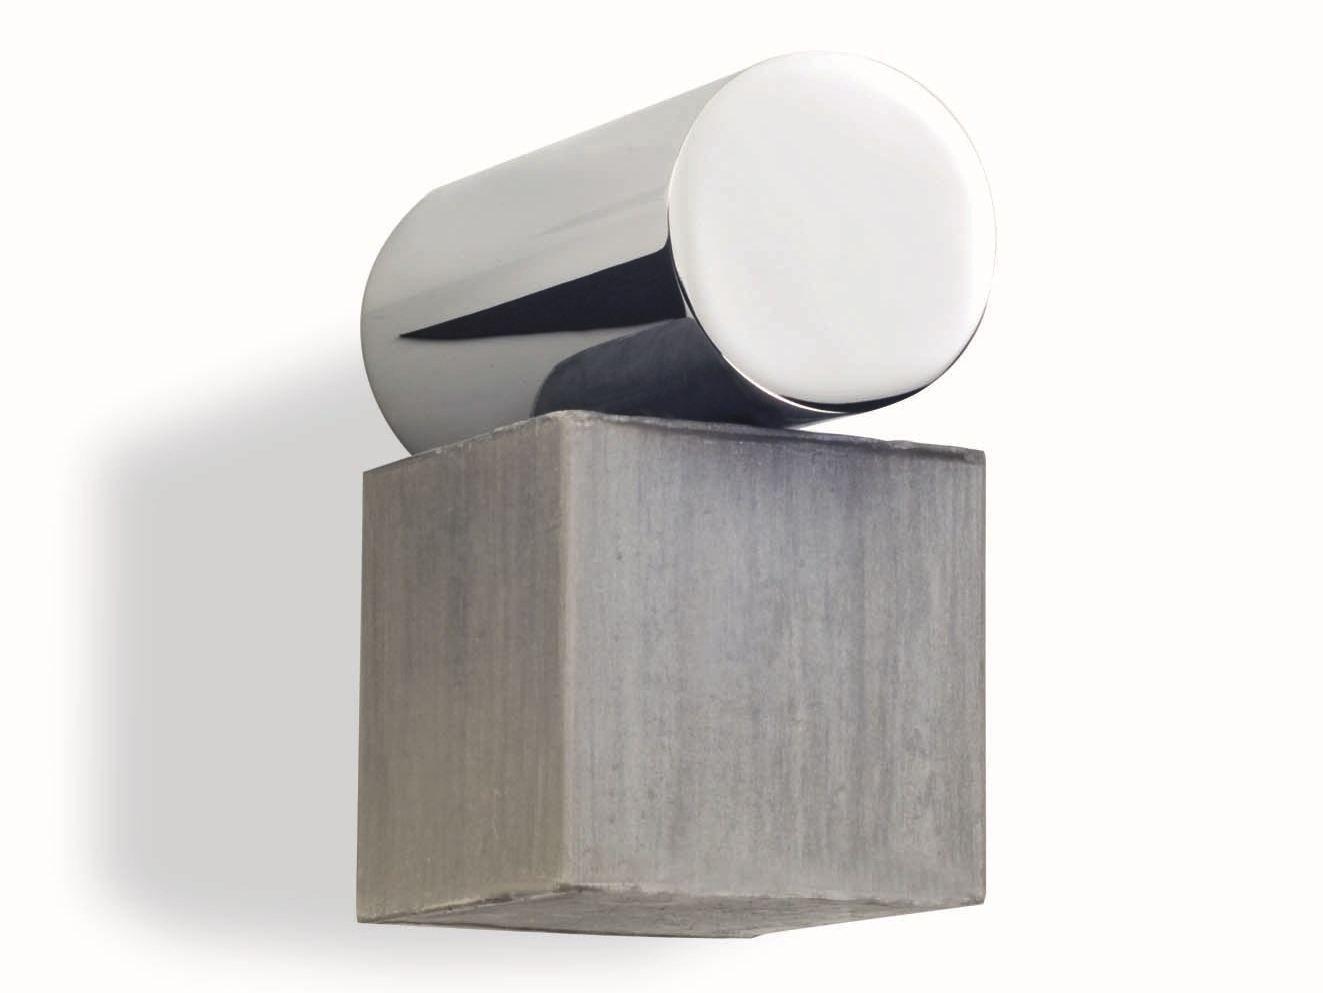 porte savon mural magn tique tb msh collection tube by. Black Bedroom Furniture Sets. Home Design Ideas